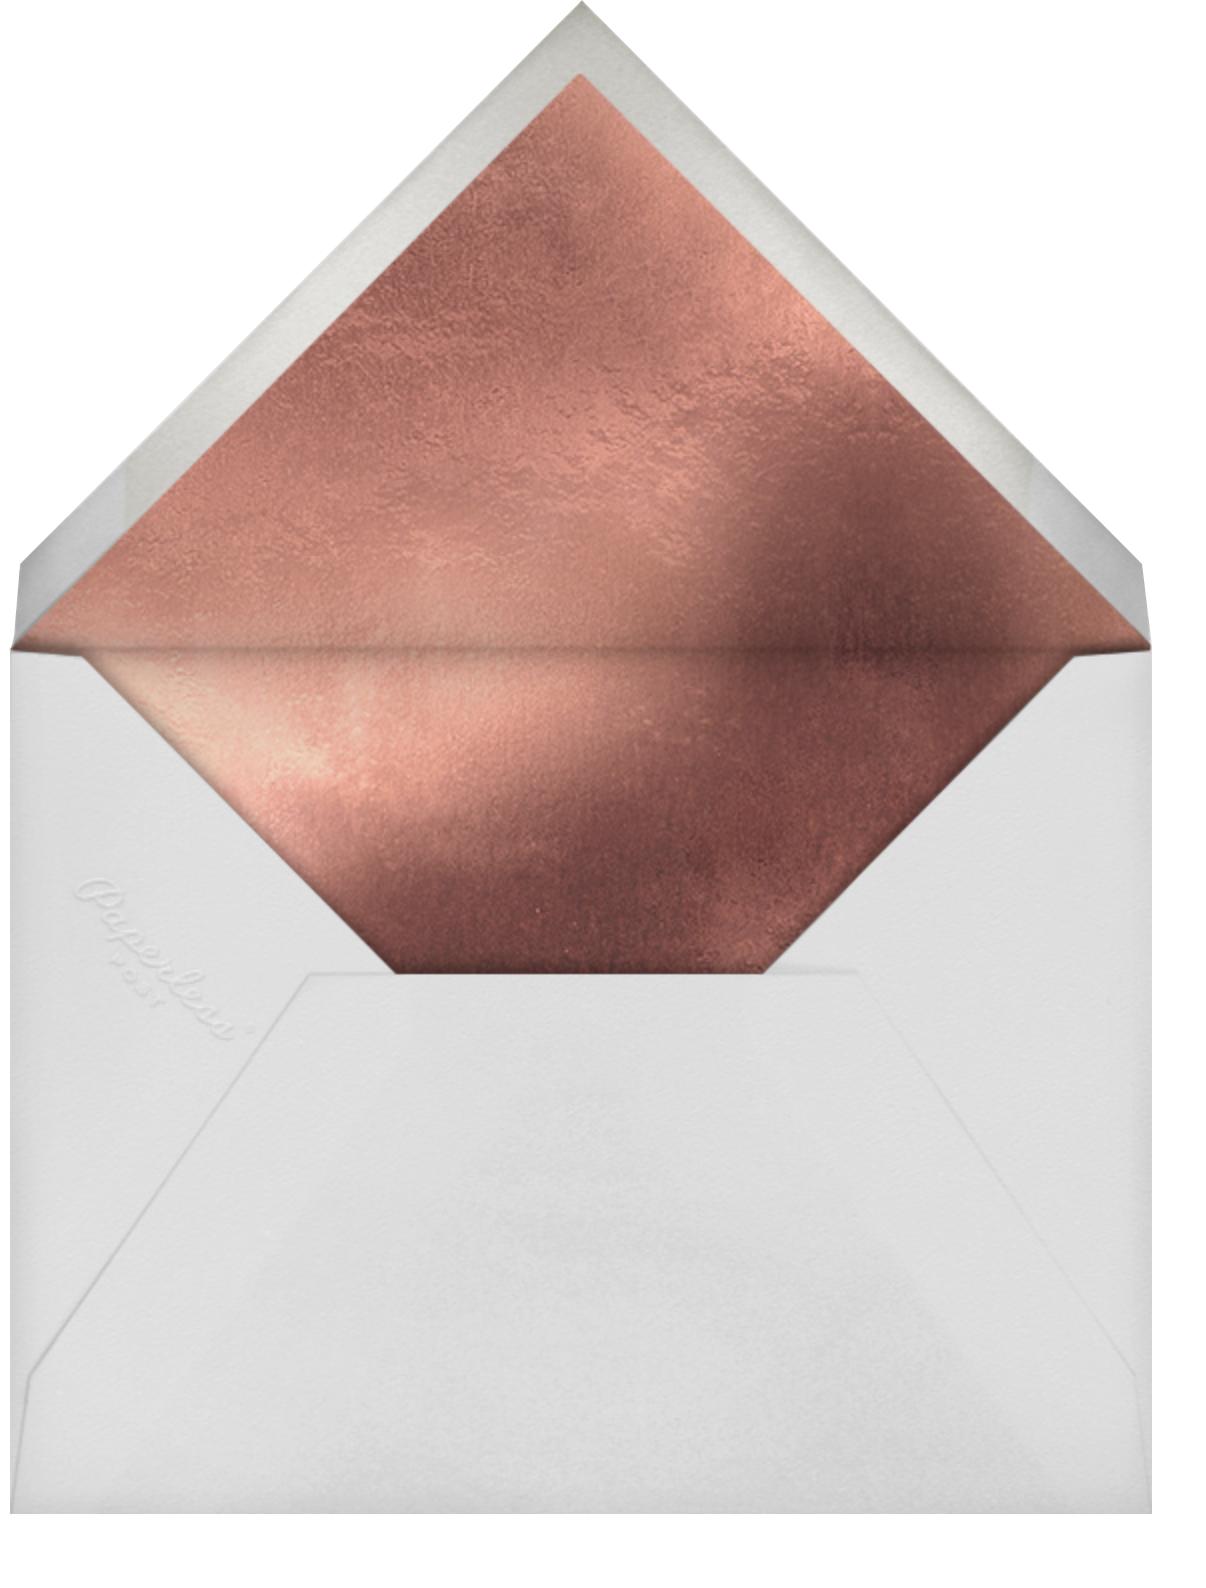 Belle Boulevard (Invitation) - Rose Gold - kate spade new york - Envelope